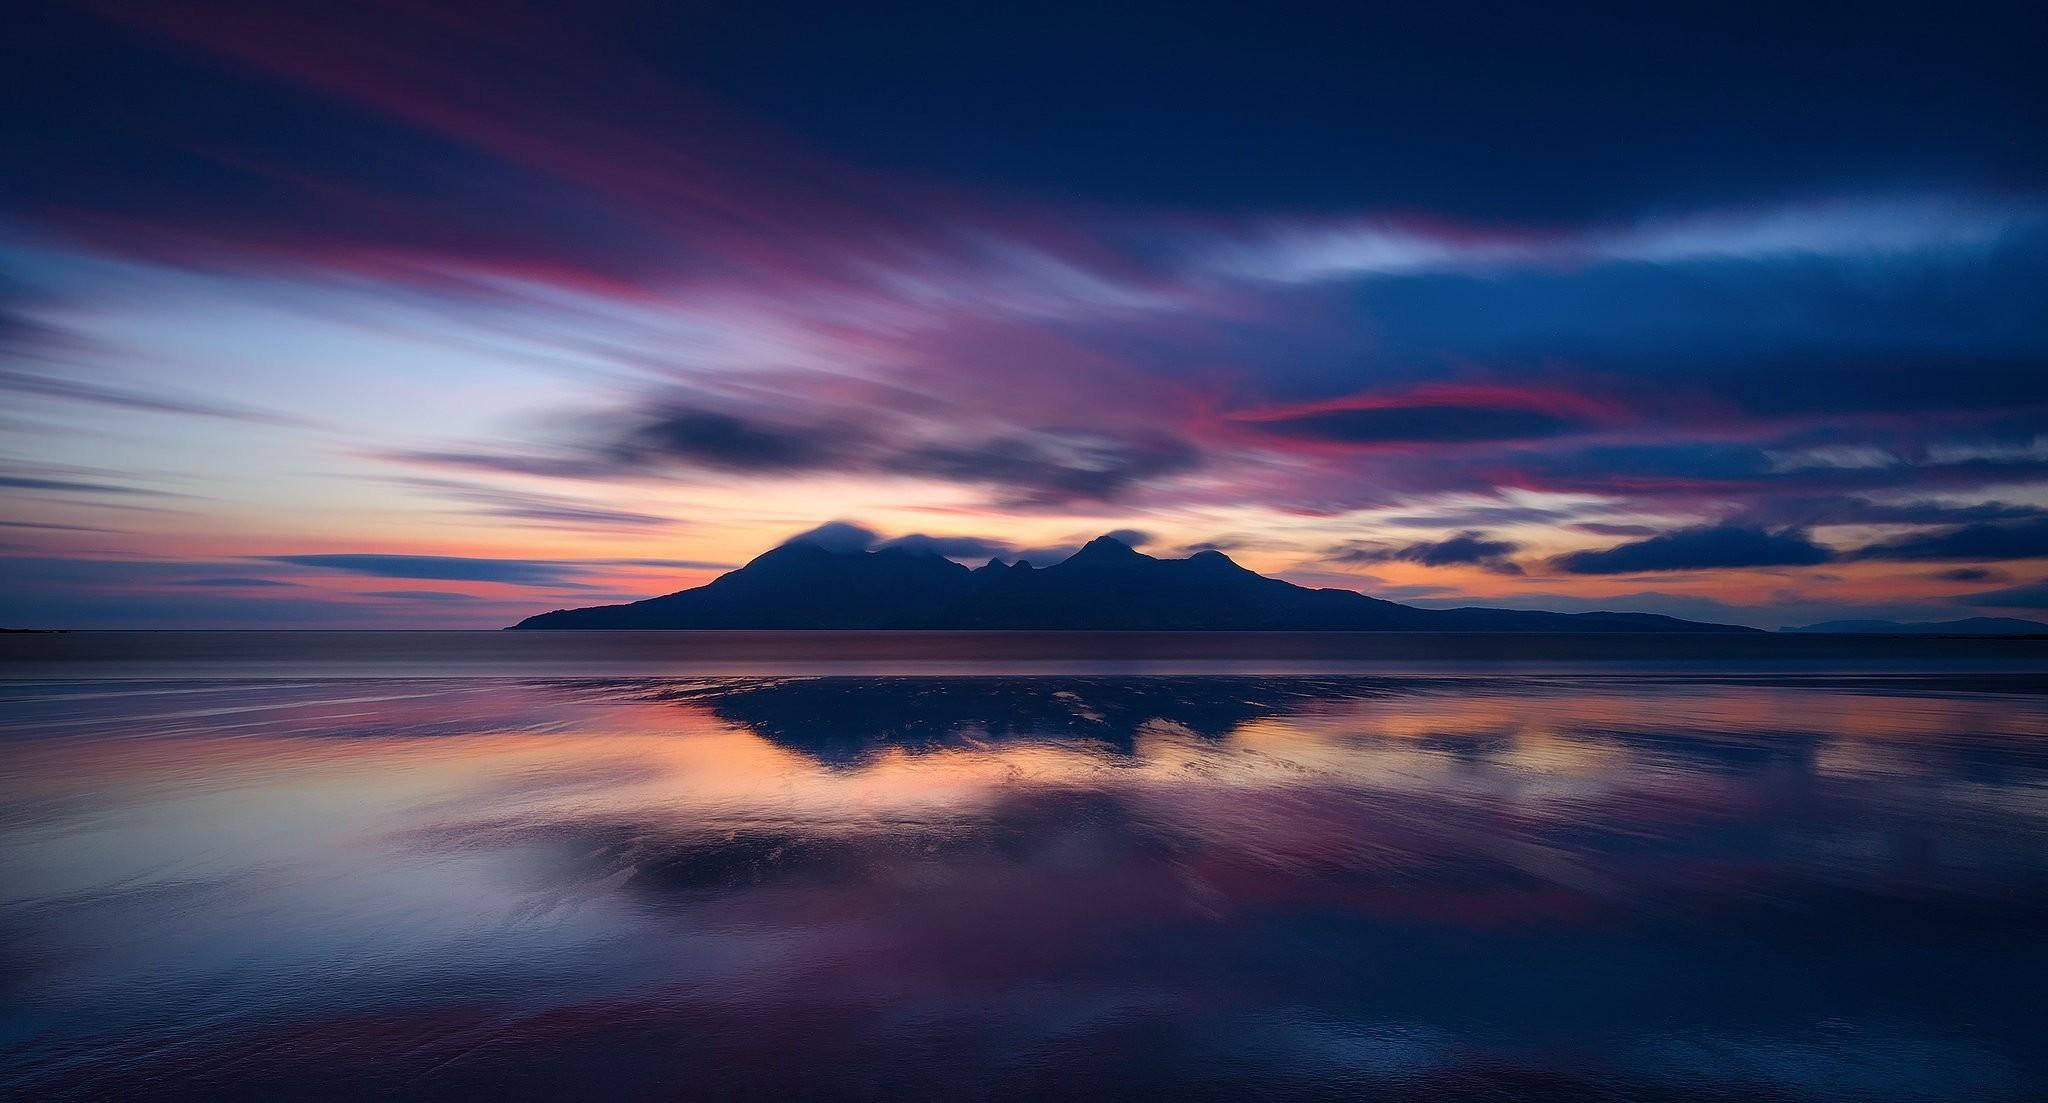 scotland island egg atlantic ocean beach night mountain clouds